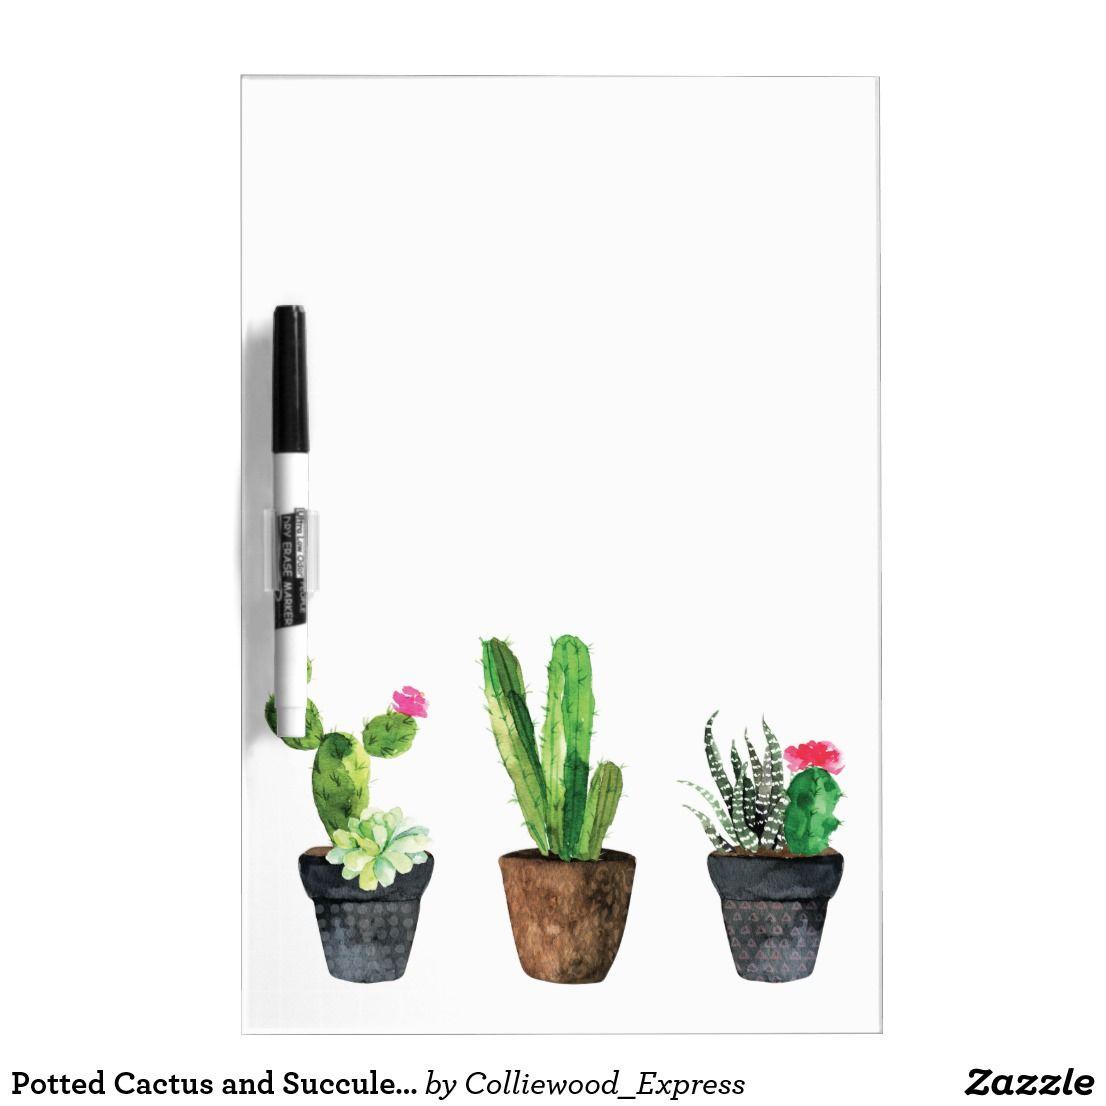 Potted Cactus And Succulents Dry Erase Board Zazzle Com Rustic Designs Cacti Succulents Succulents Dry Erase Board